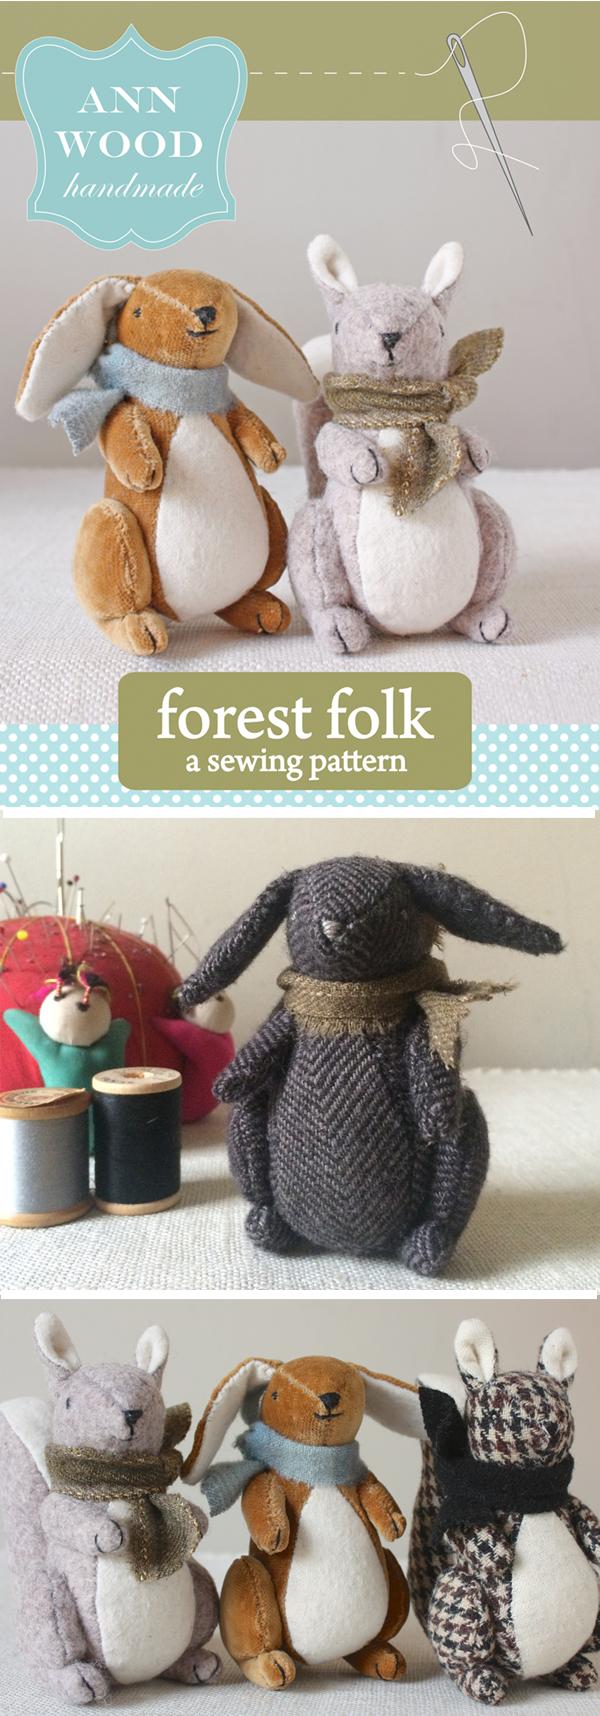 forest folk sewing pattern